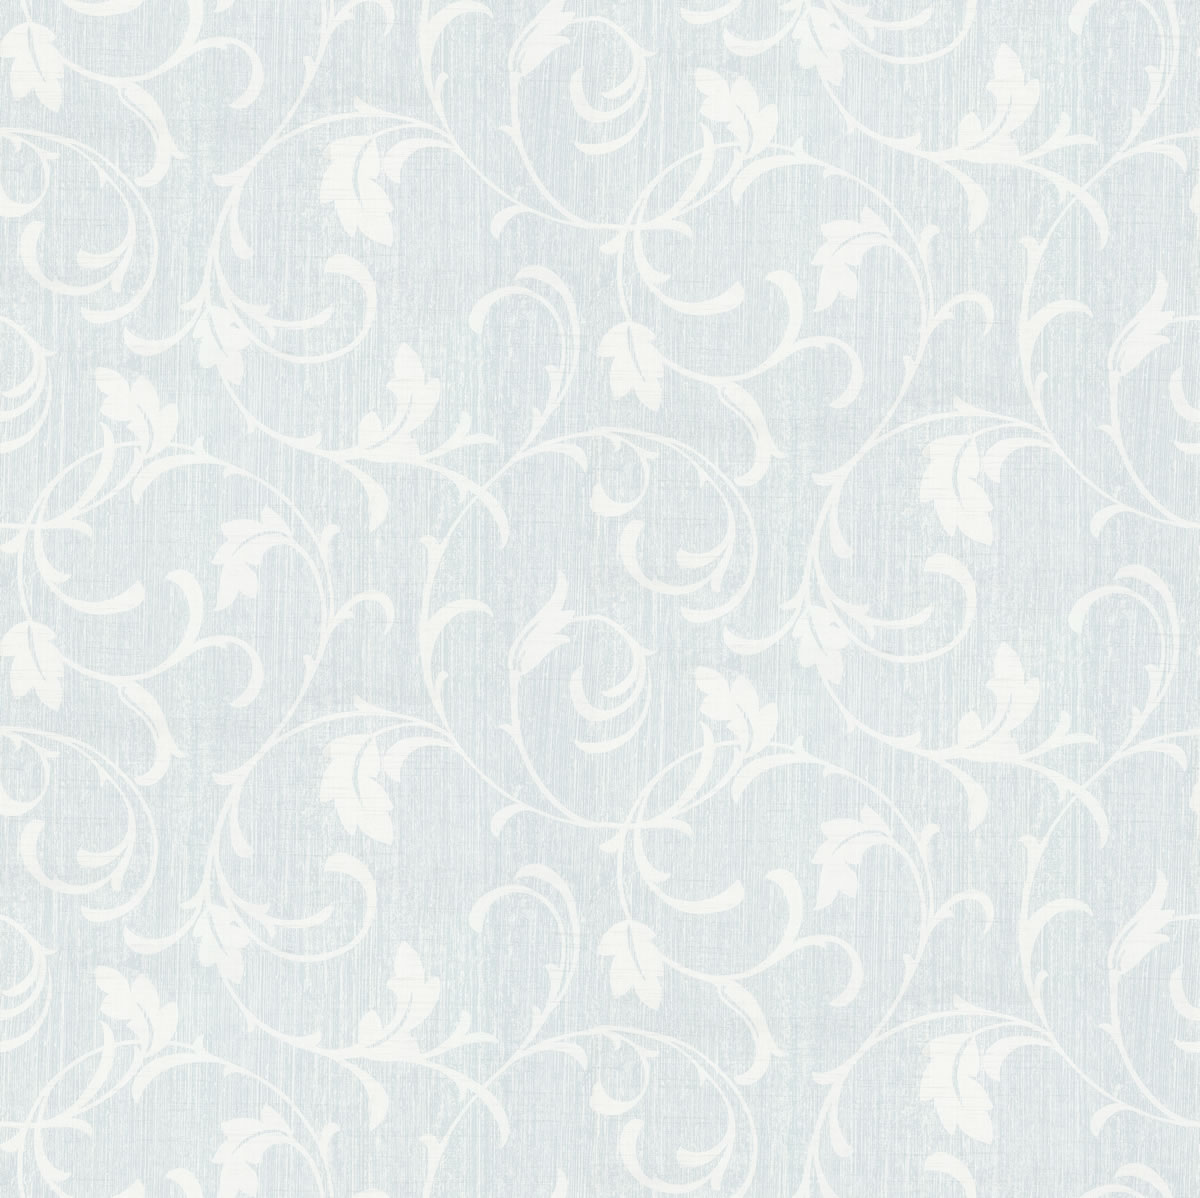 Papel de Parede Azul Suave FS692007